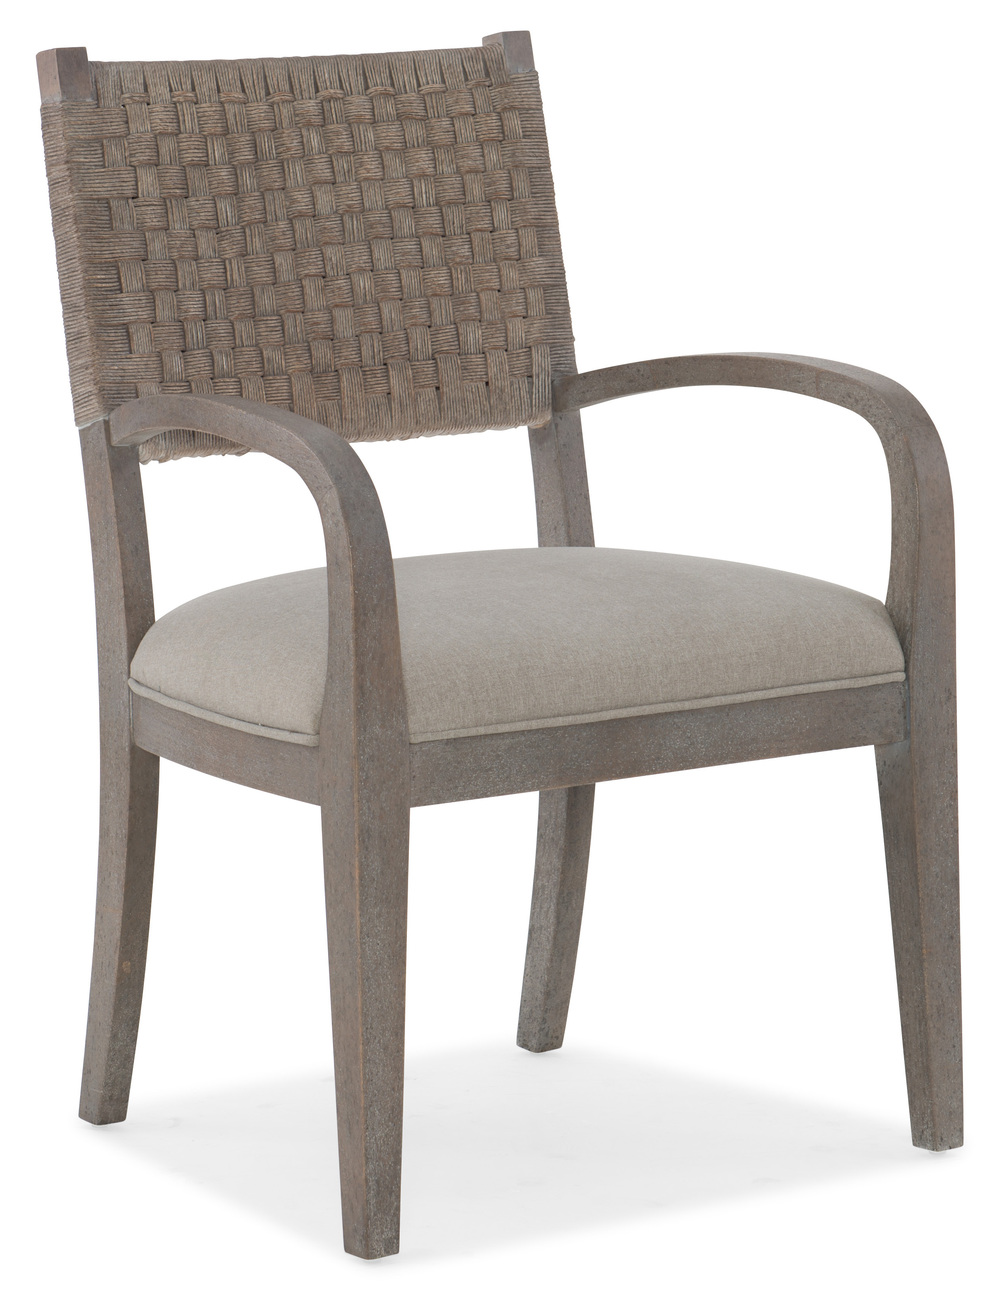 Hooker Furniture - Artemis Woven Arm Chair